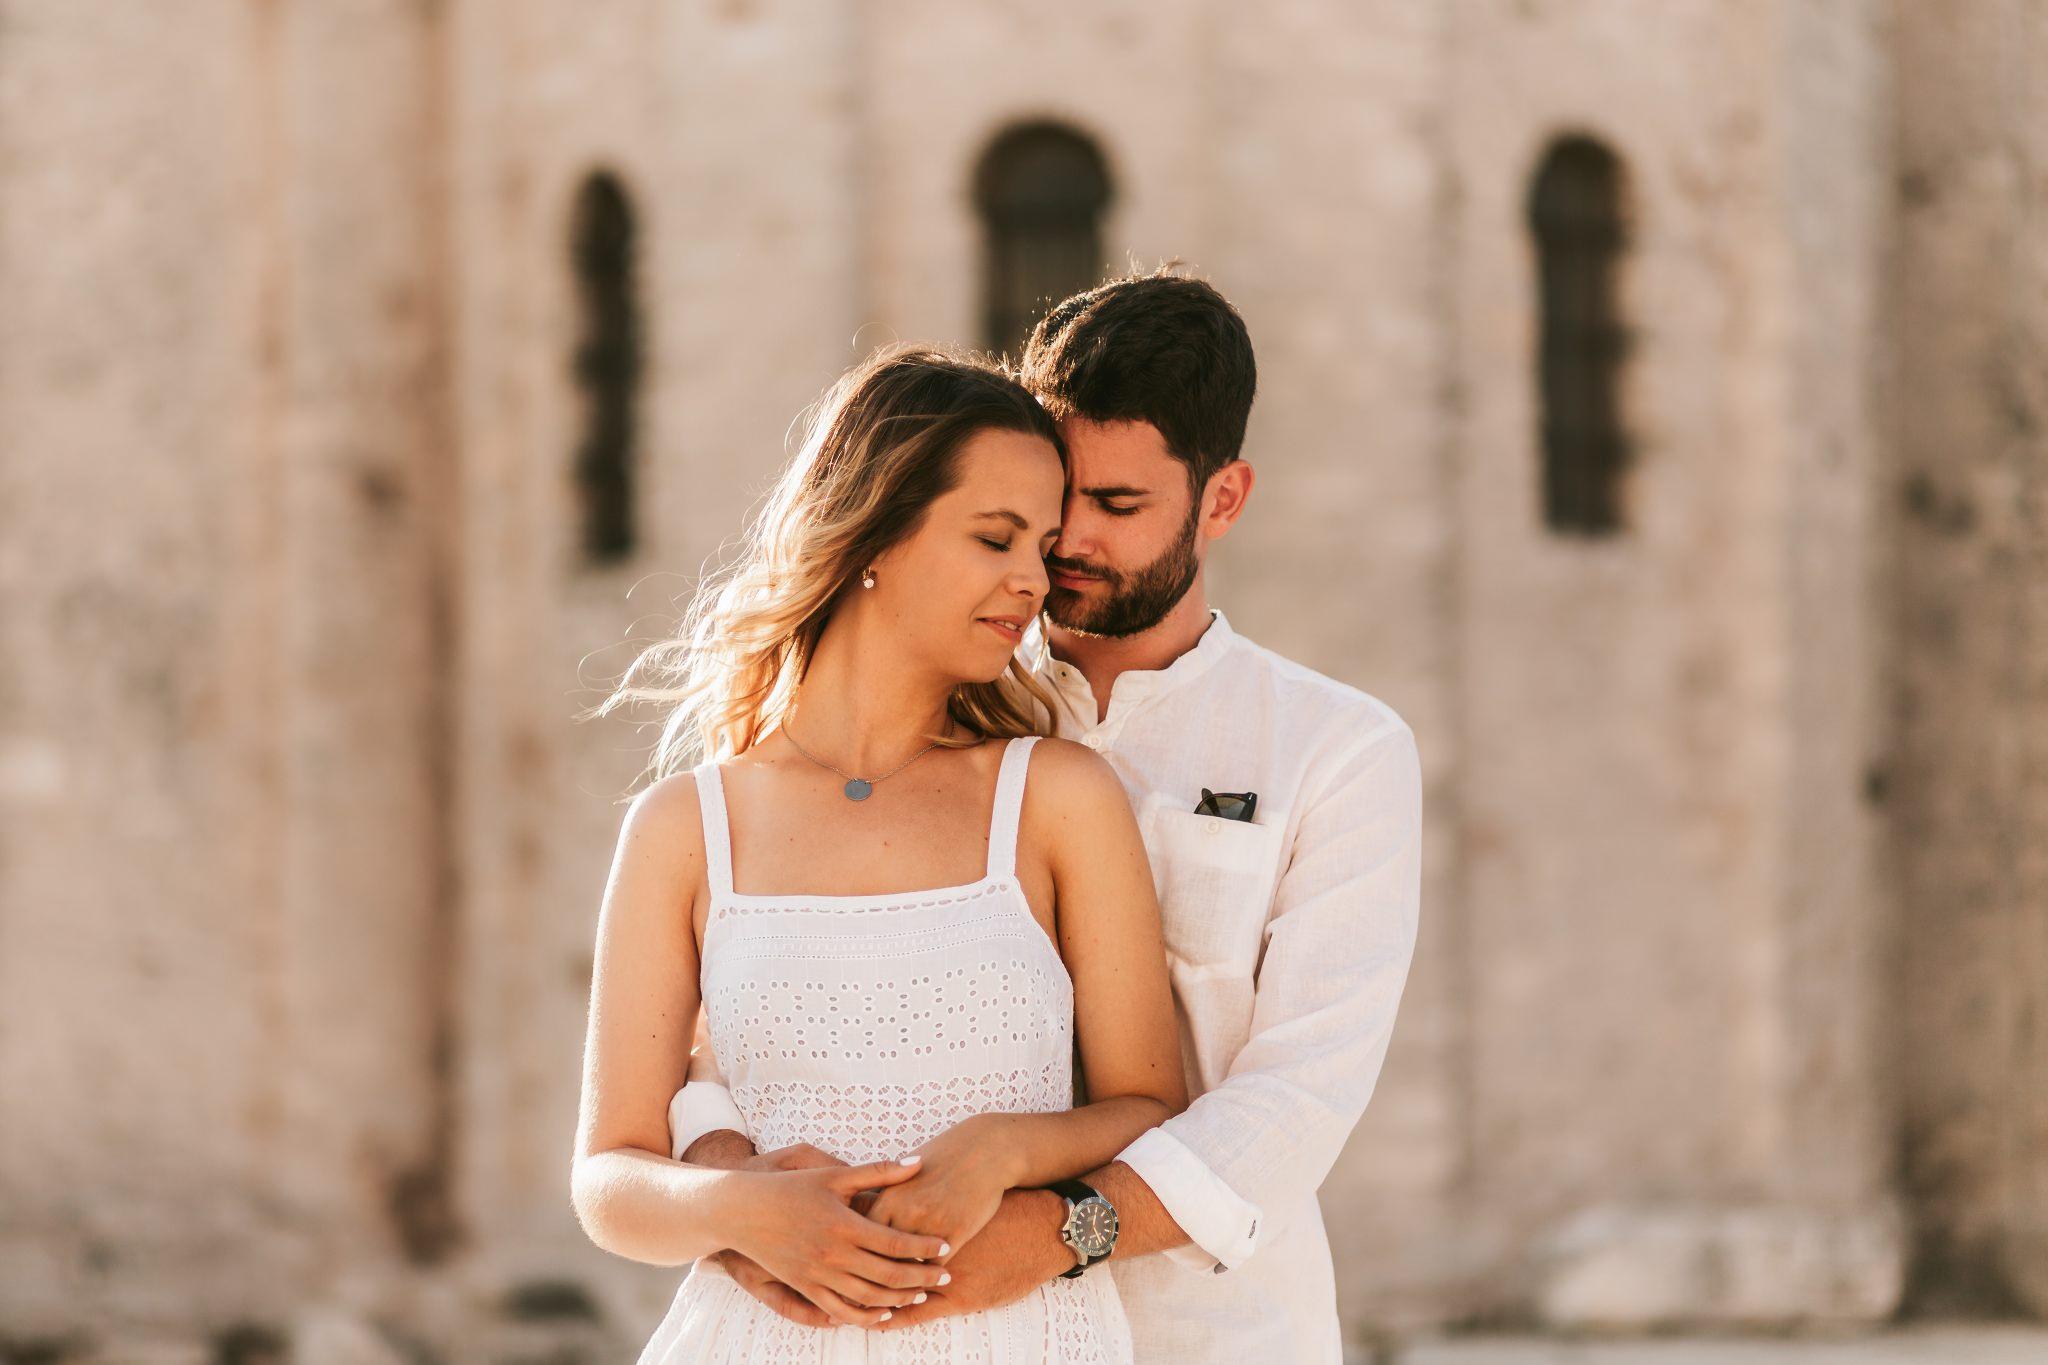 fotograf vjencanja zadar vjencanje zadar robert kale weddings